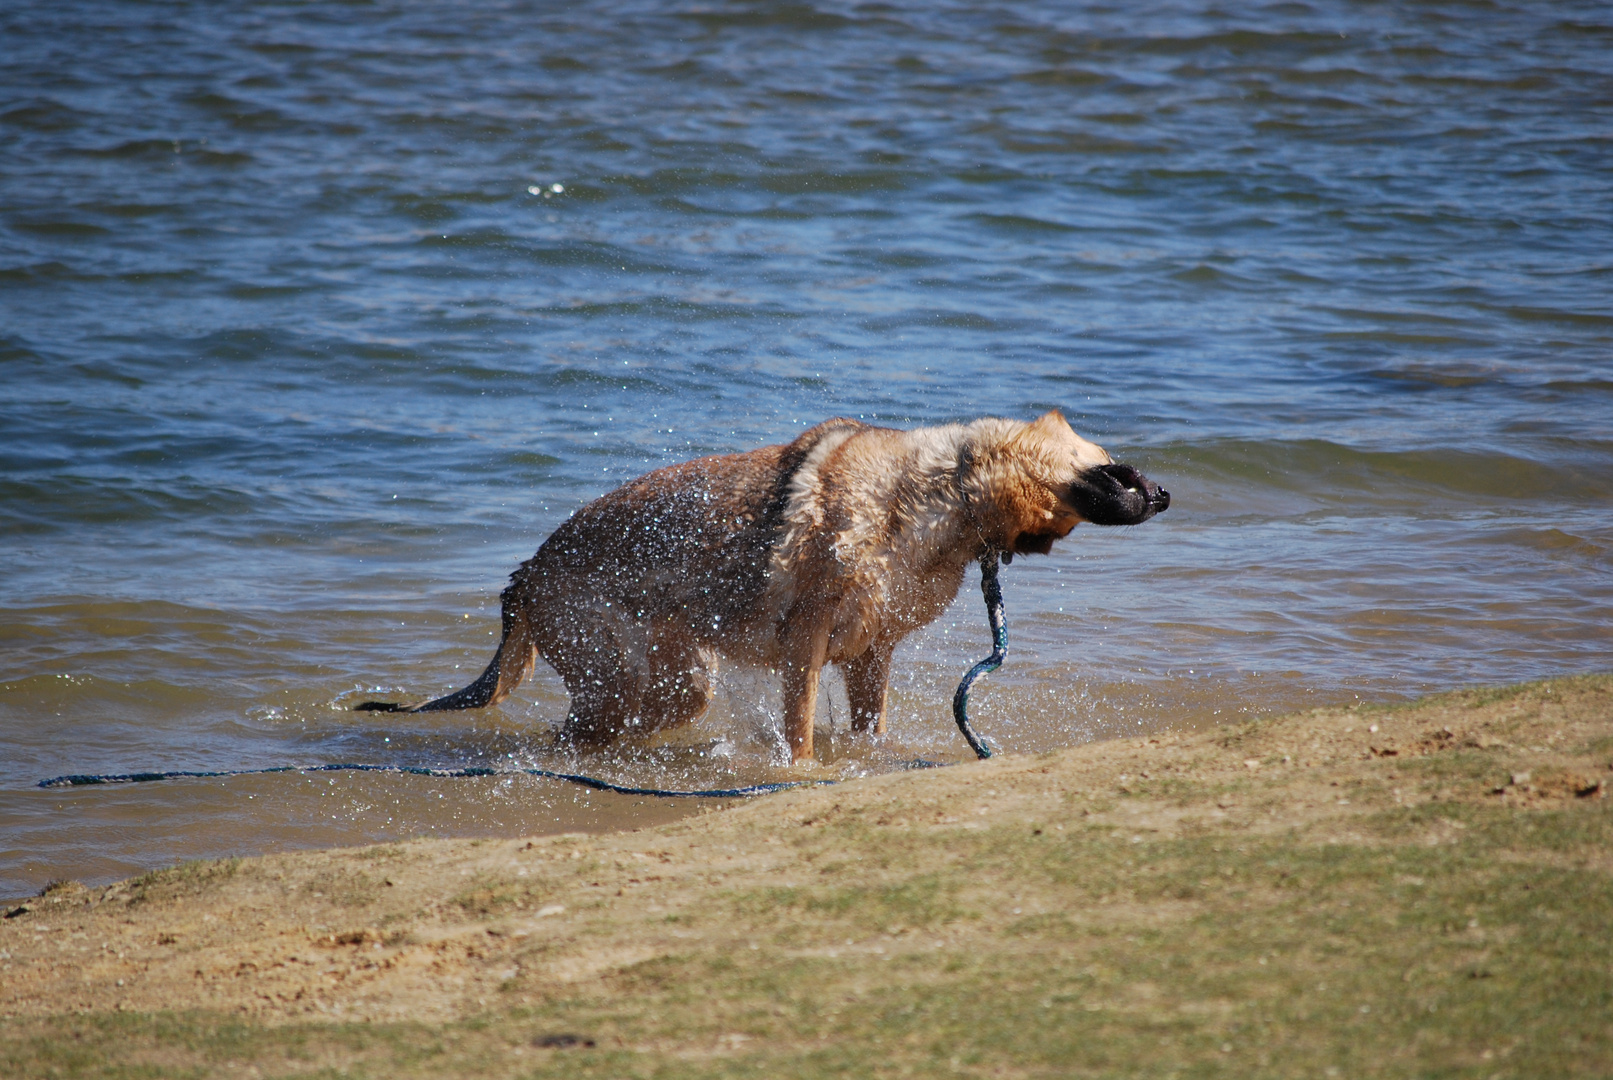 Hund am See 2